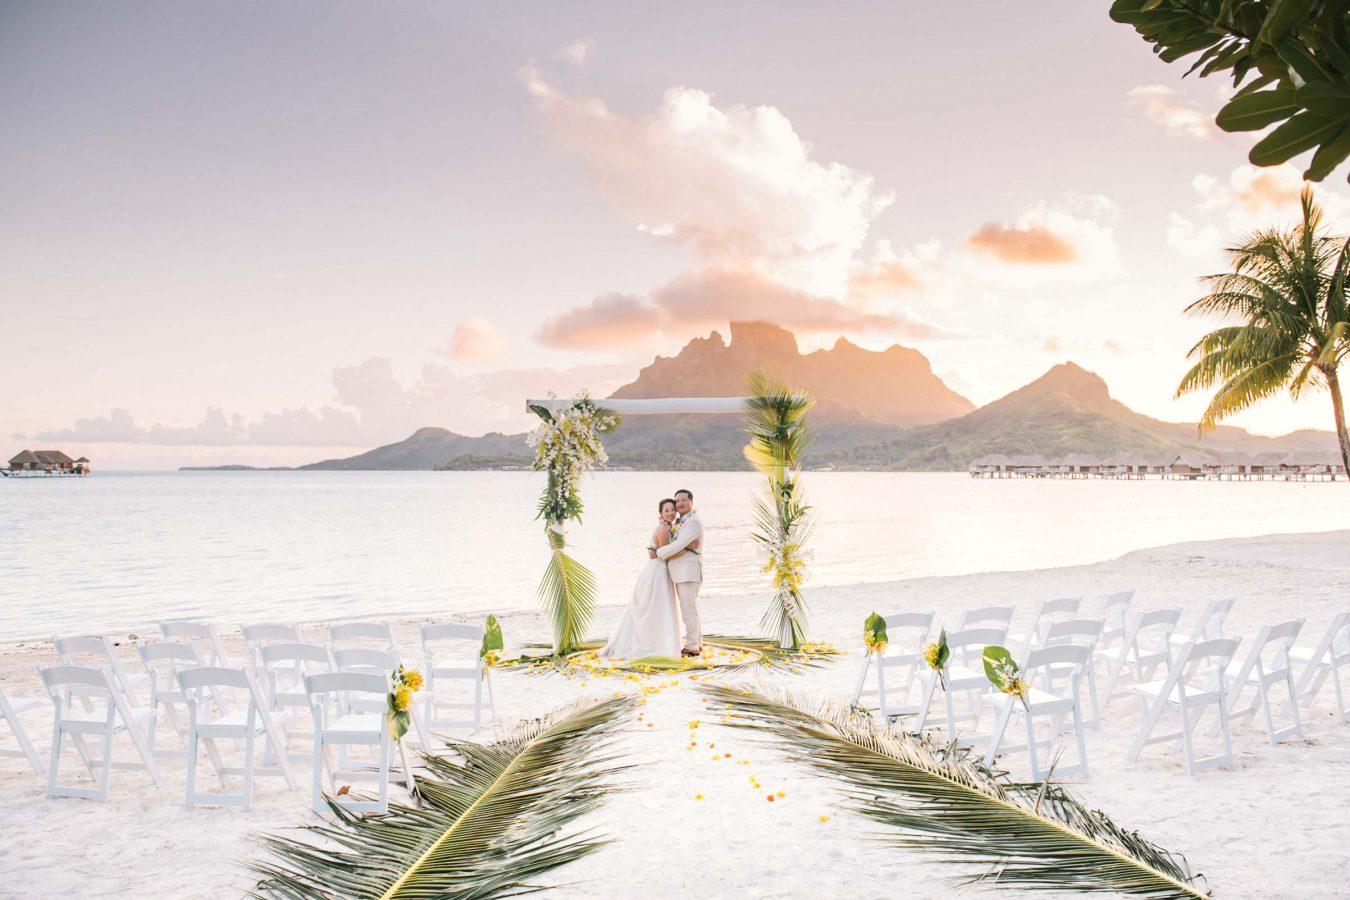 Sunset wedding ceremony at the Four Seasons Bora Bora